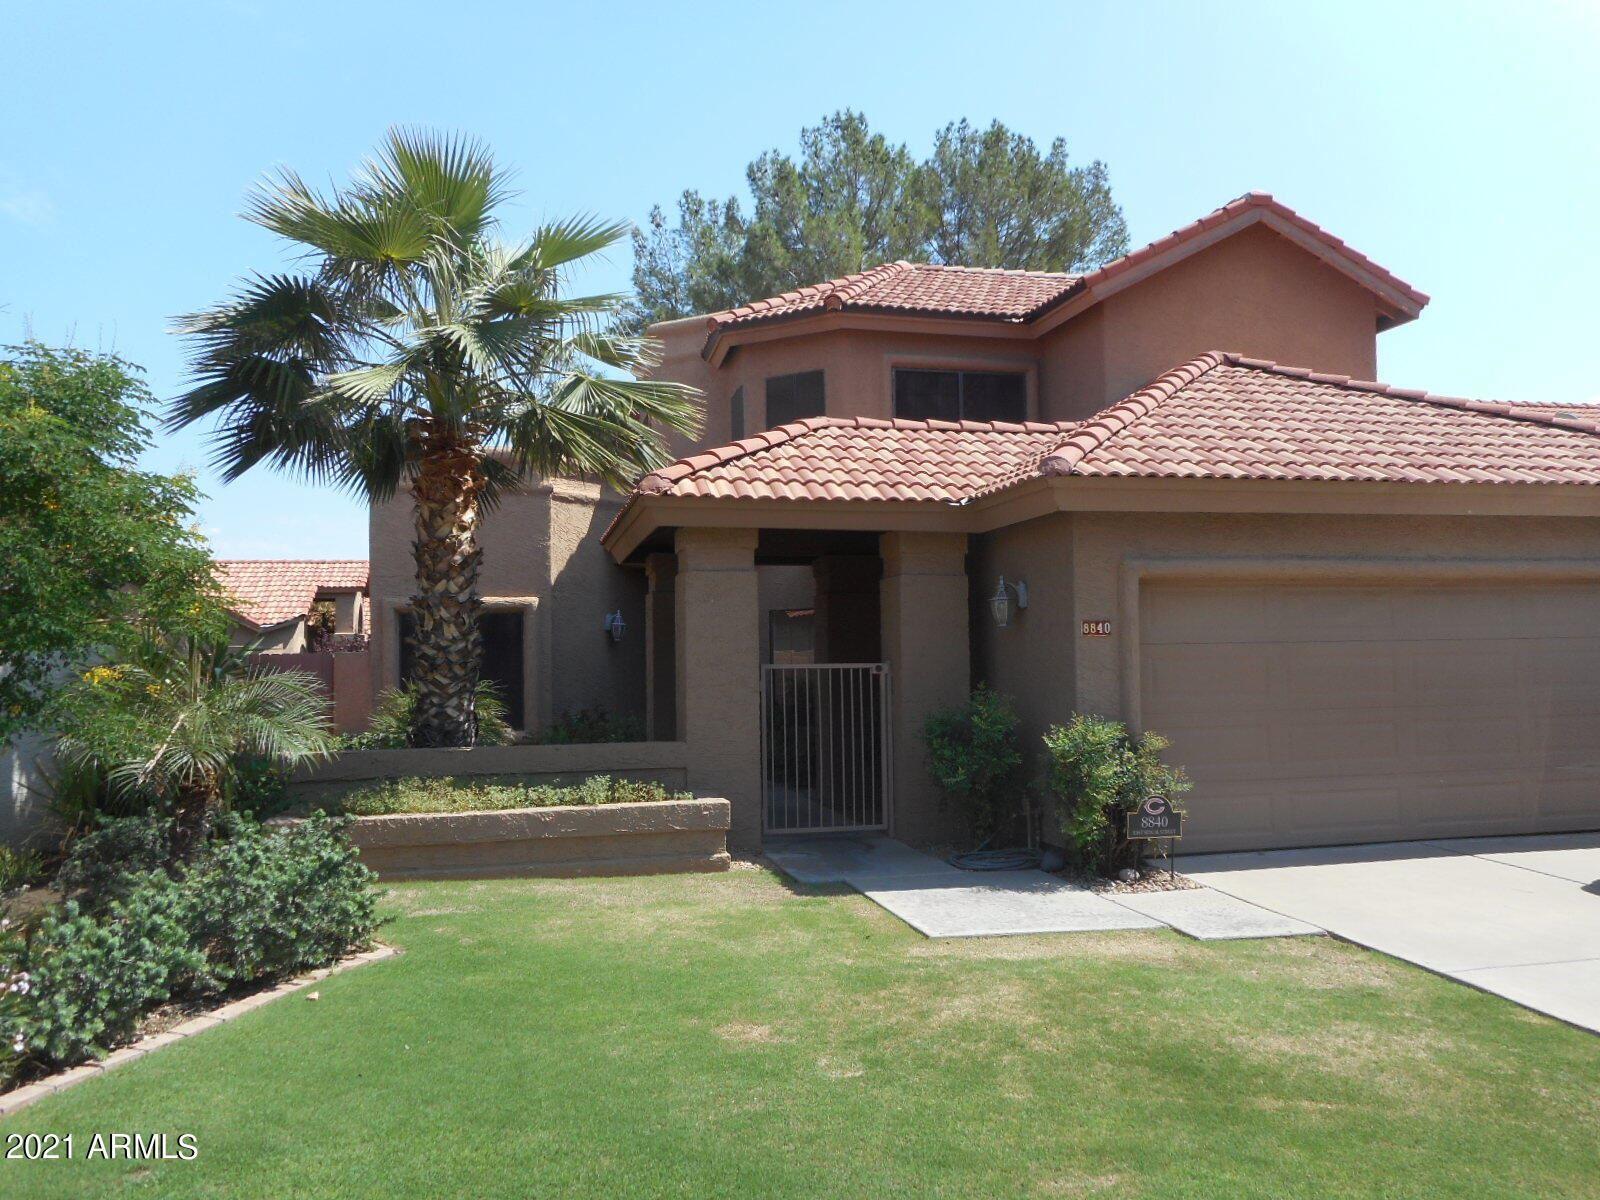 8840 E MESCAL Street, Scottsdale, AZ 85260 - MLS#: 6231462